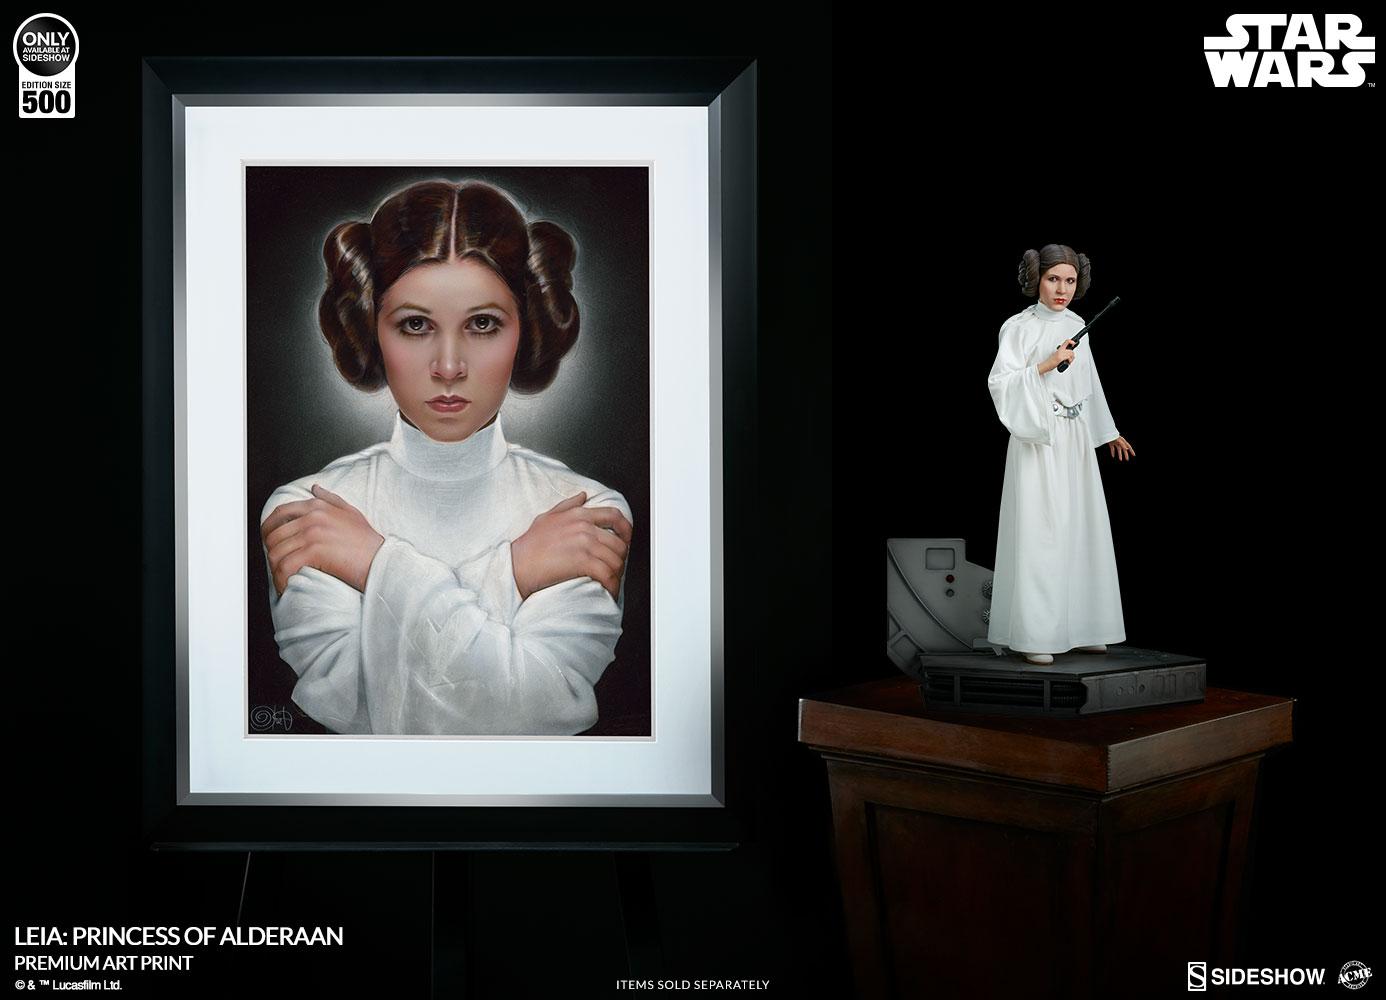 Leia: Princess of Alderaan AP 2